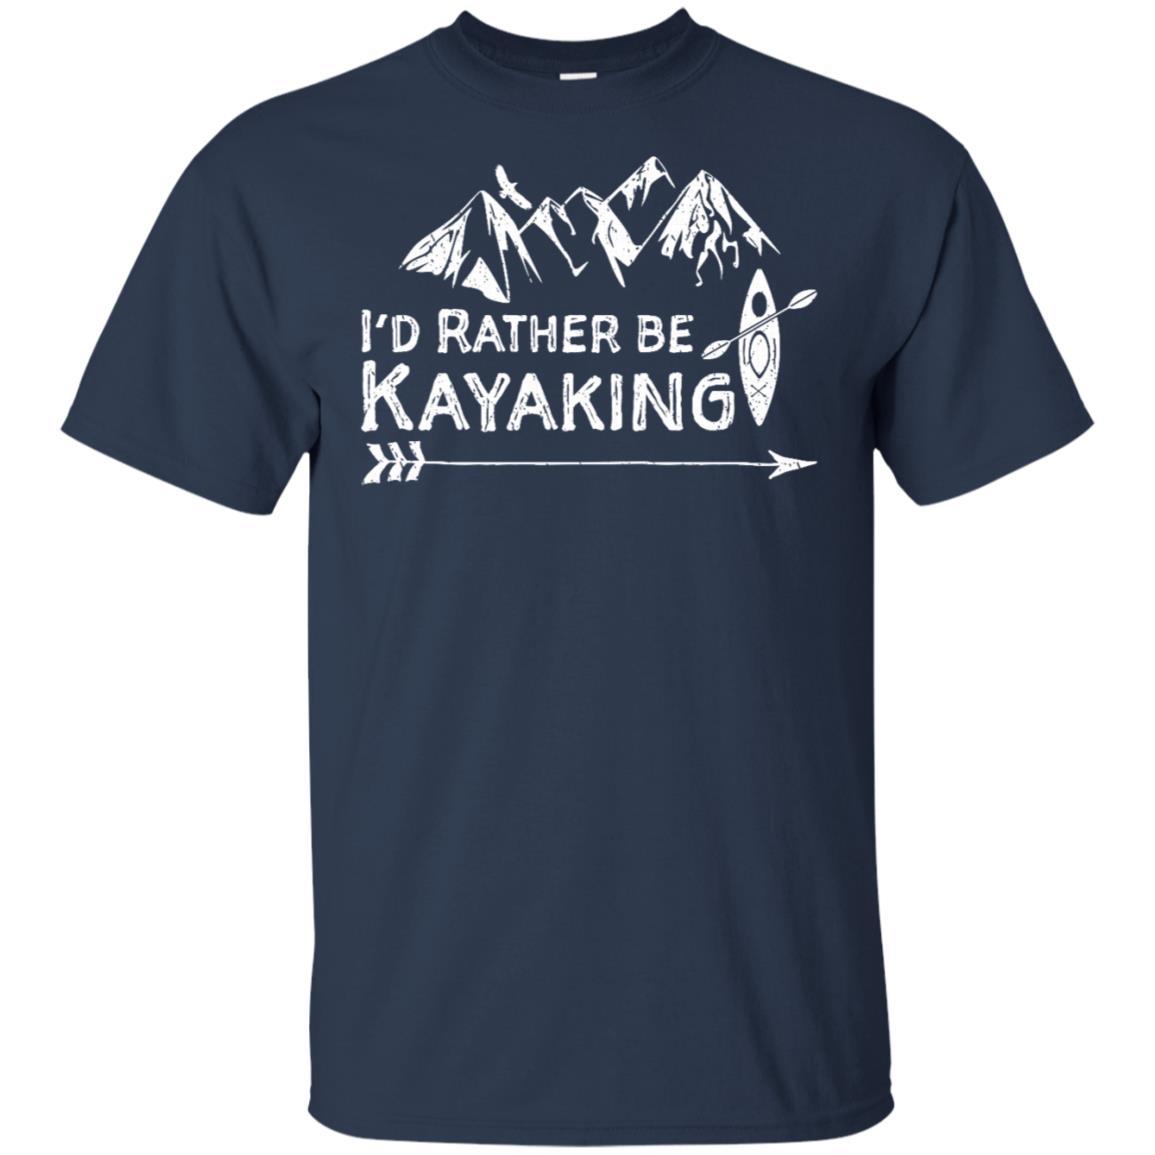 I'd Rather Be Kayaking Outdoors Kayak Unisex Short Sleeve